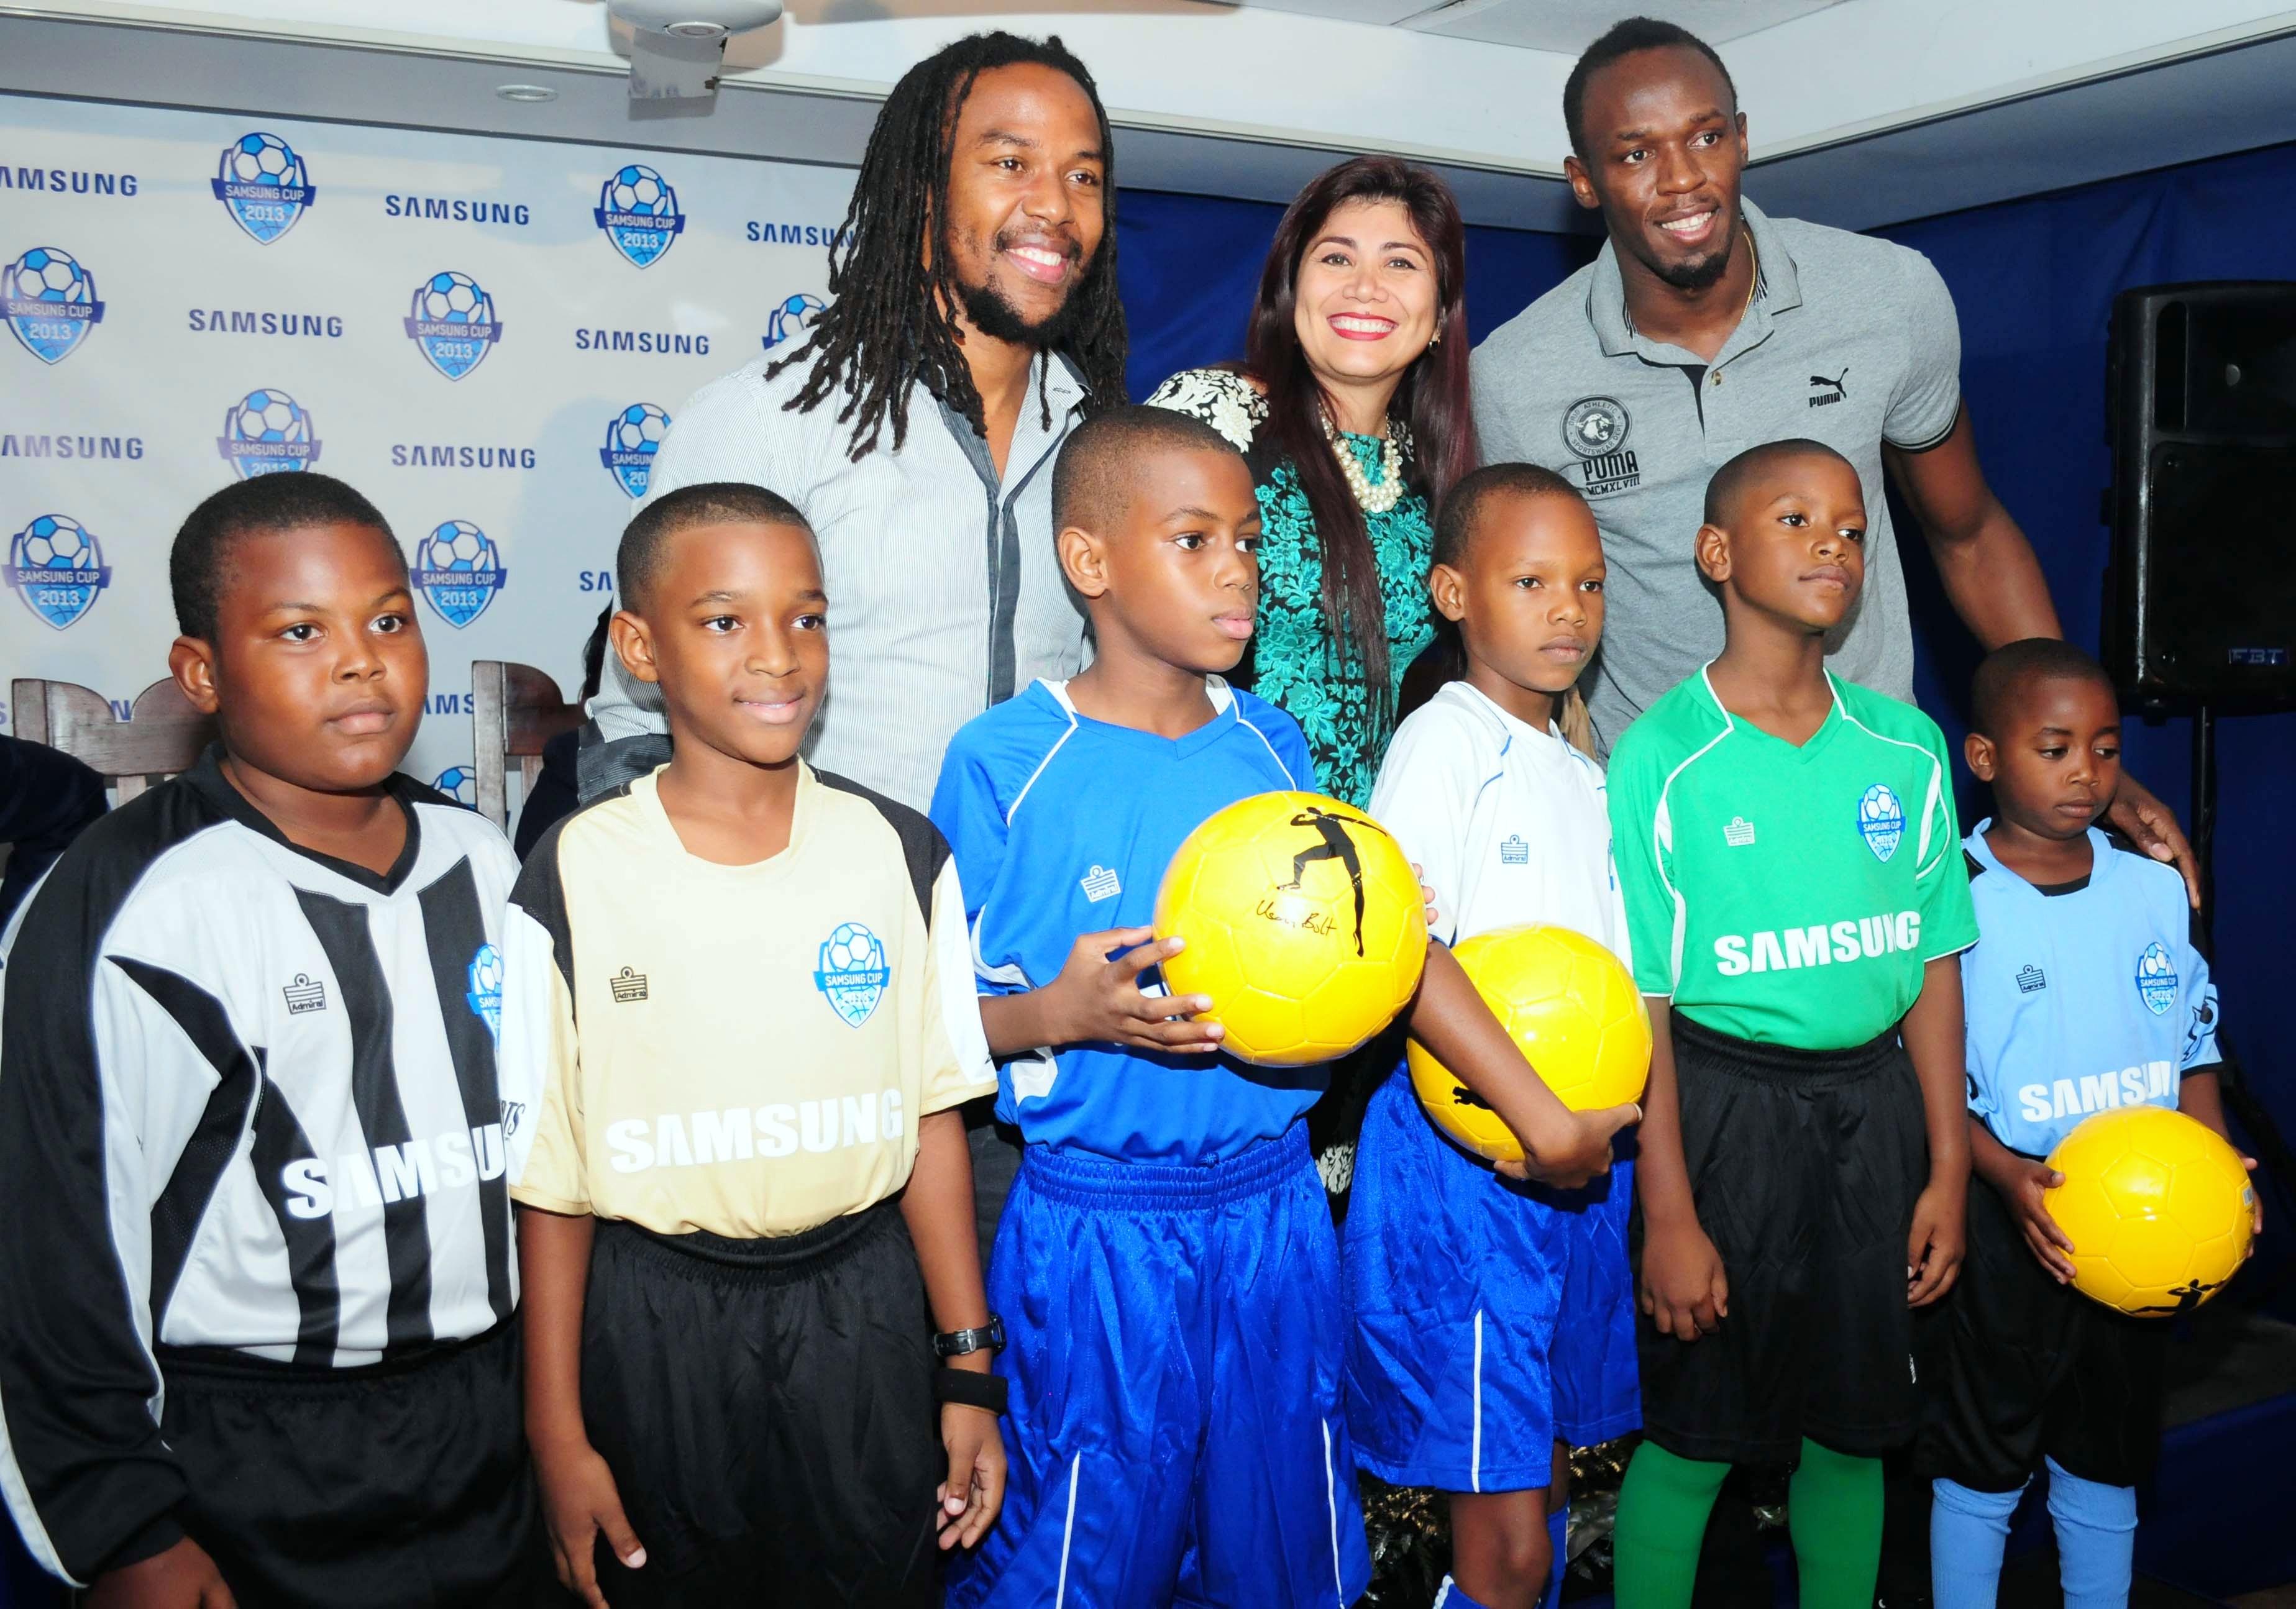 Usain Bolt Foundation sponsors Samsung Cup